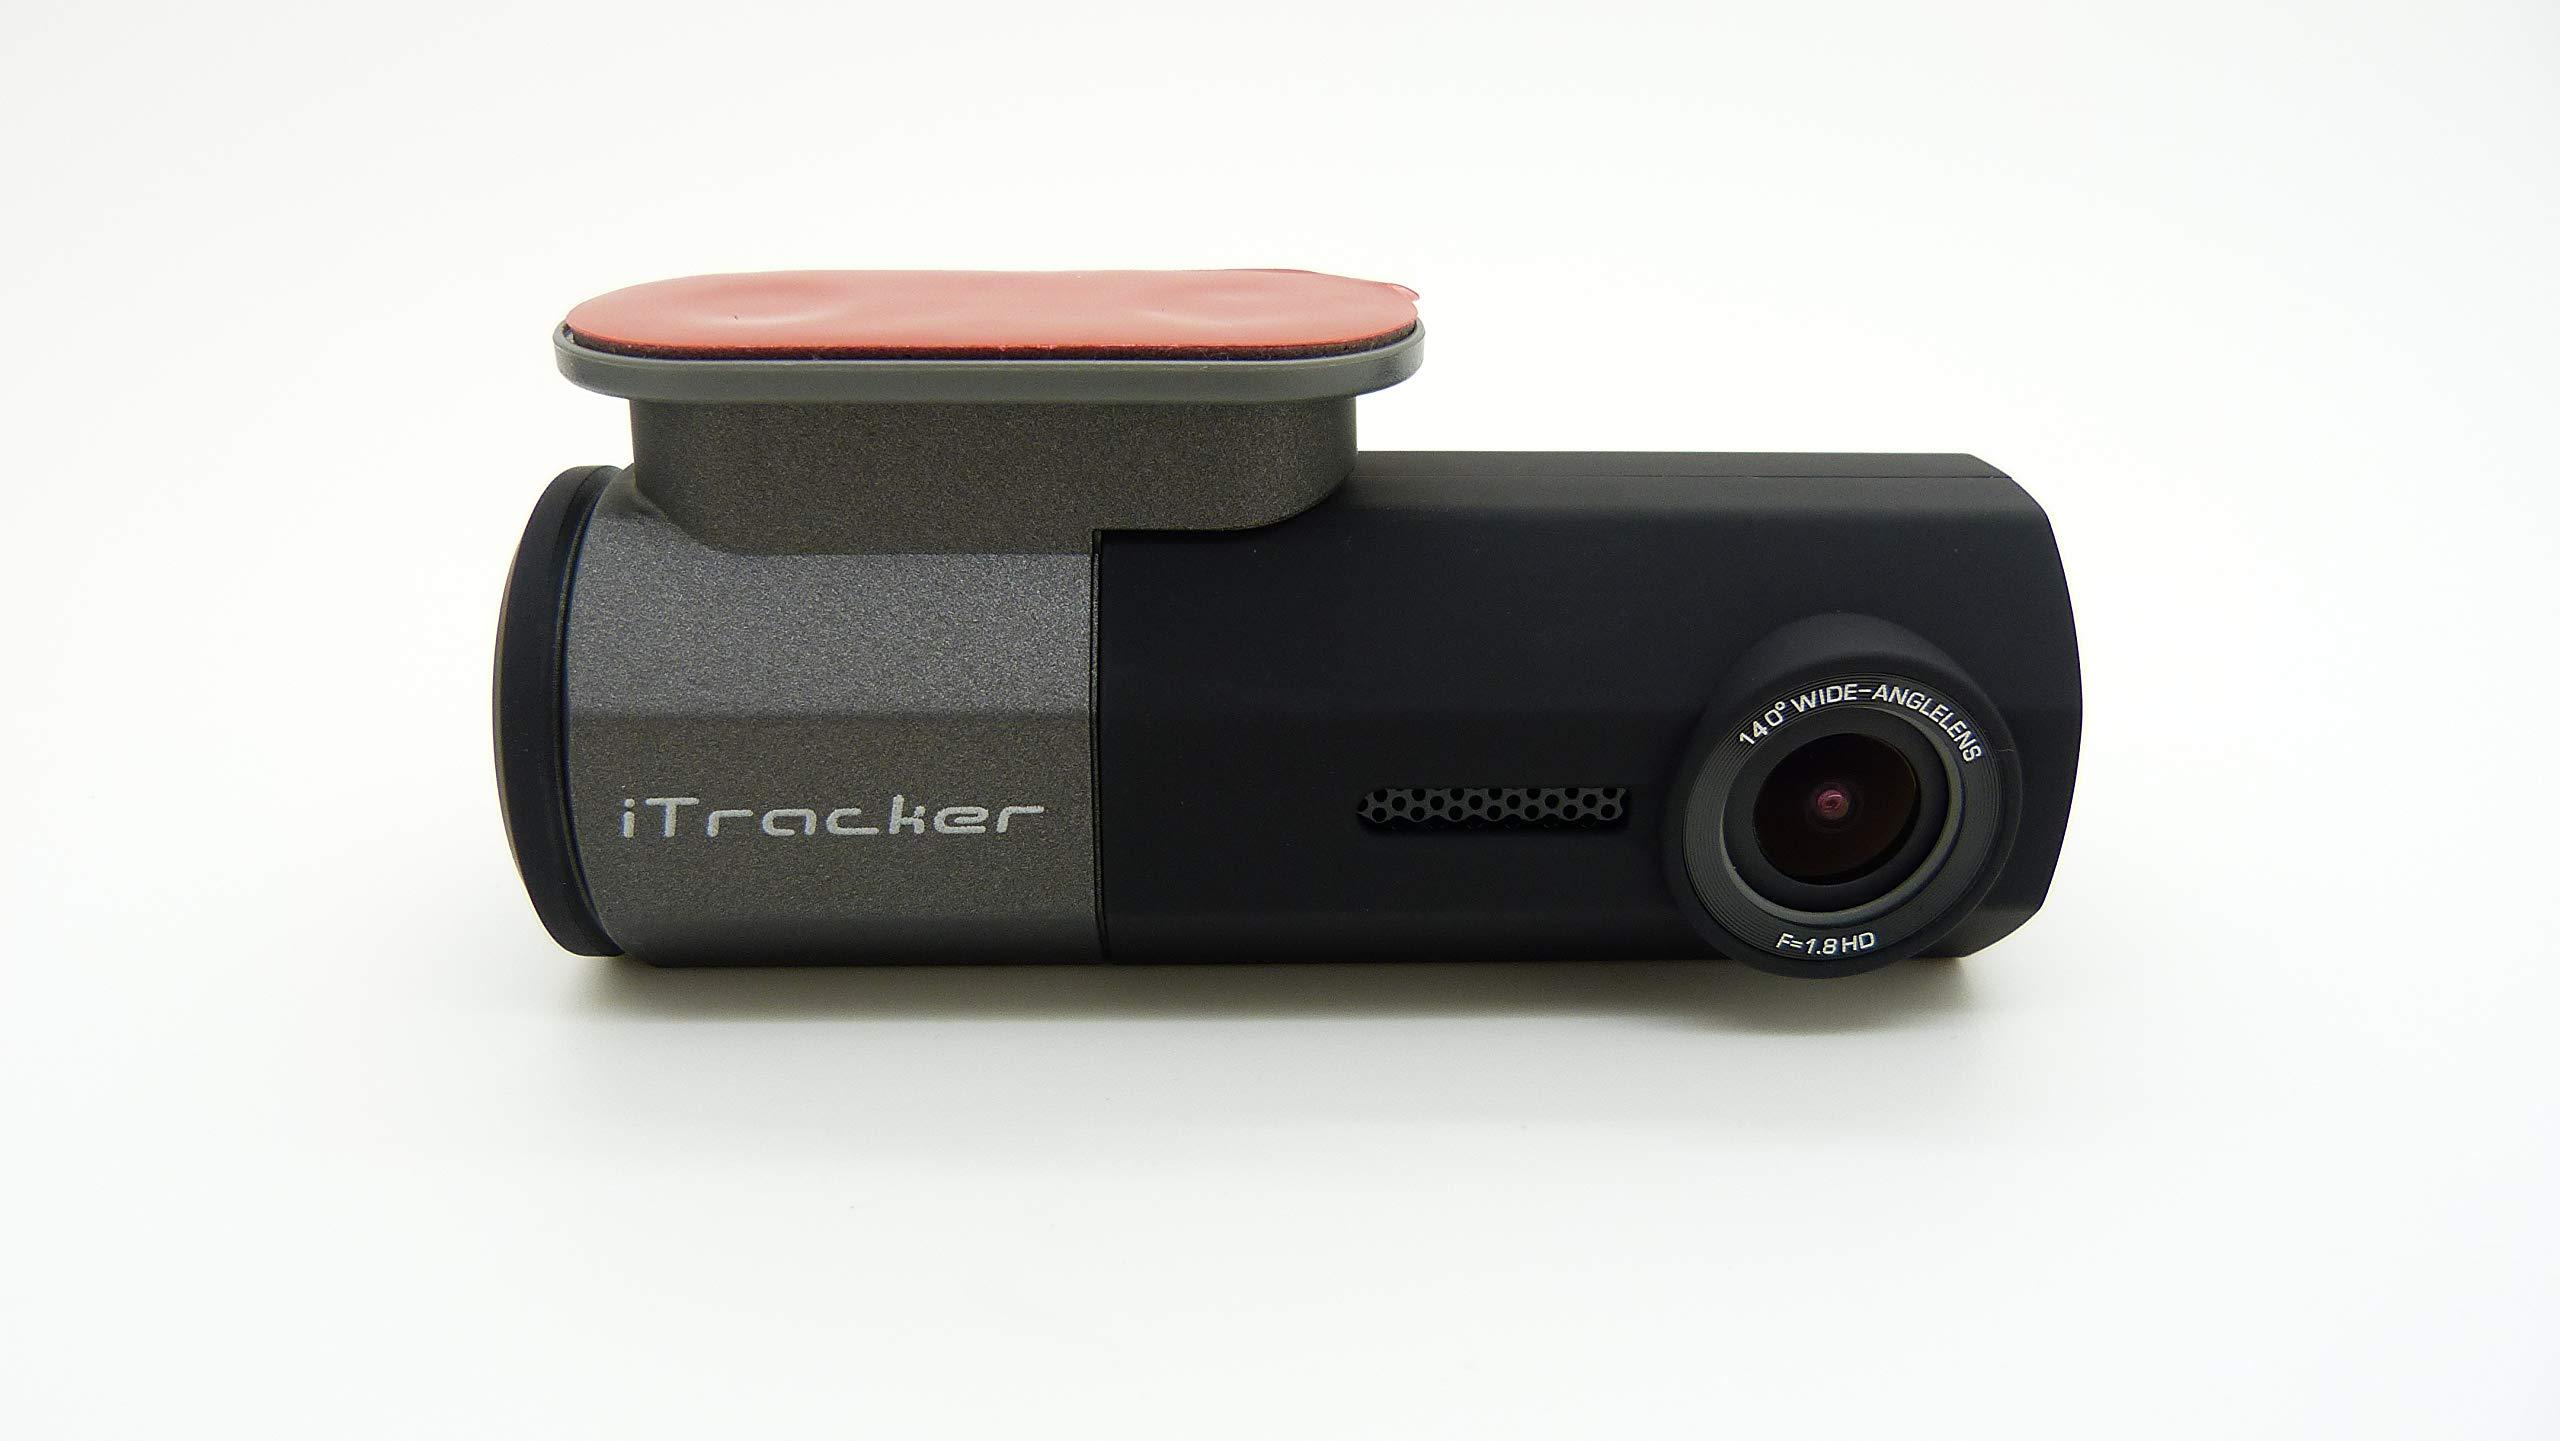 iTracker-Dashcam-GPS-Carcam-Autokamera-Full-HD-Dash-Cam-mini0806-S-mini0906